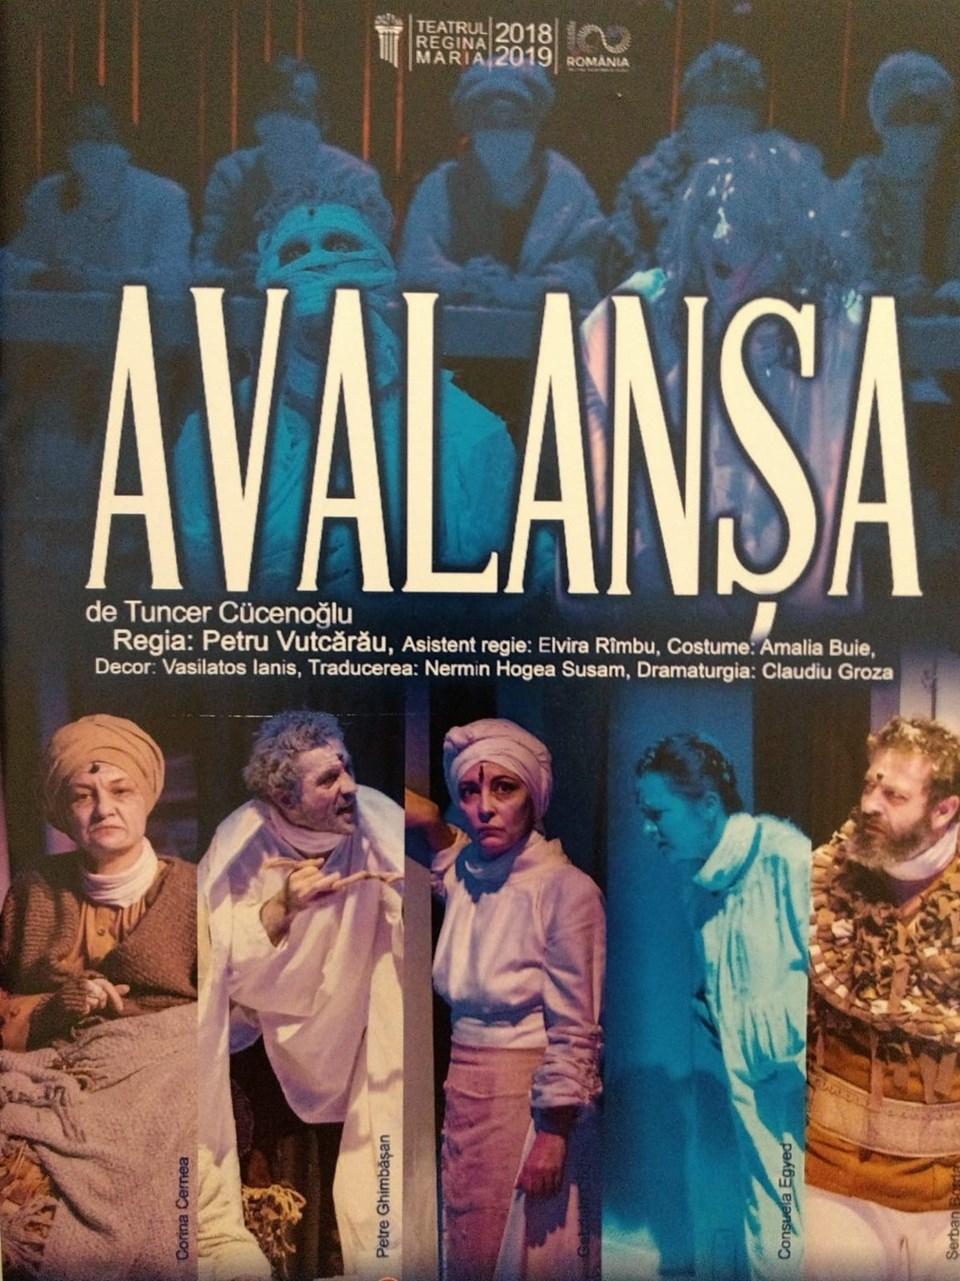 queen,QHtS9aFYNUqEjUL77zEJfA - Romanya Queen Mary Tiyatrosu Türk oyununu sahneliyor